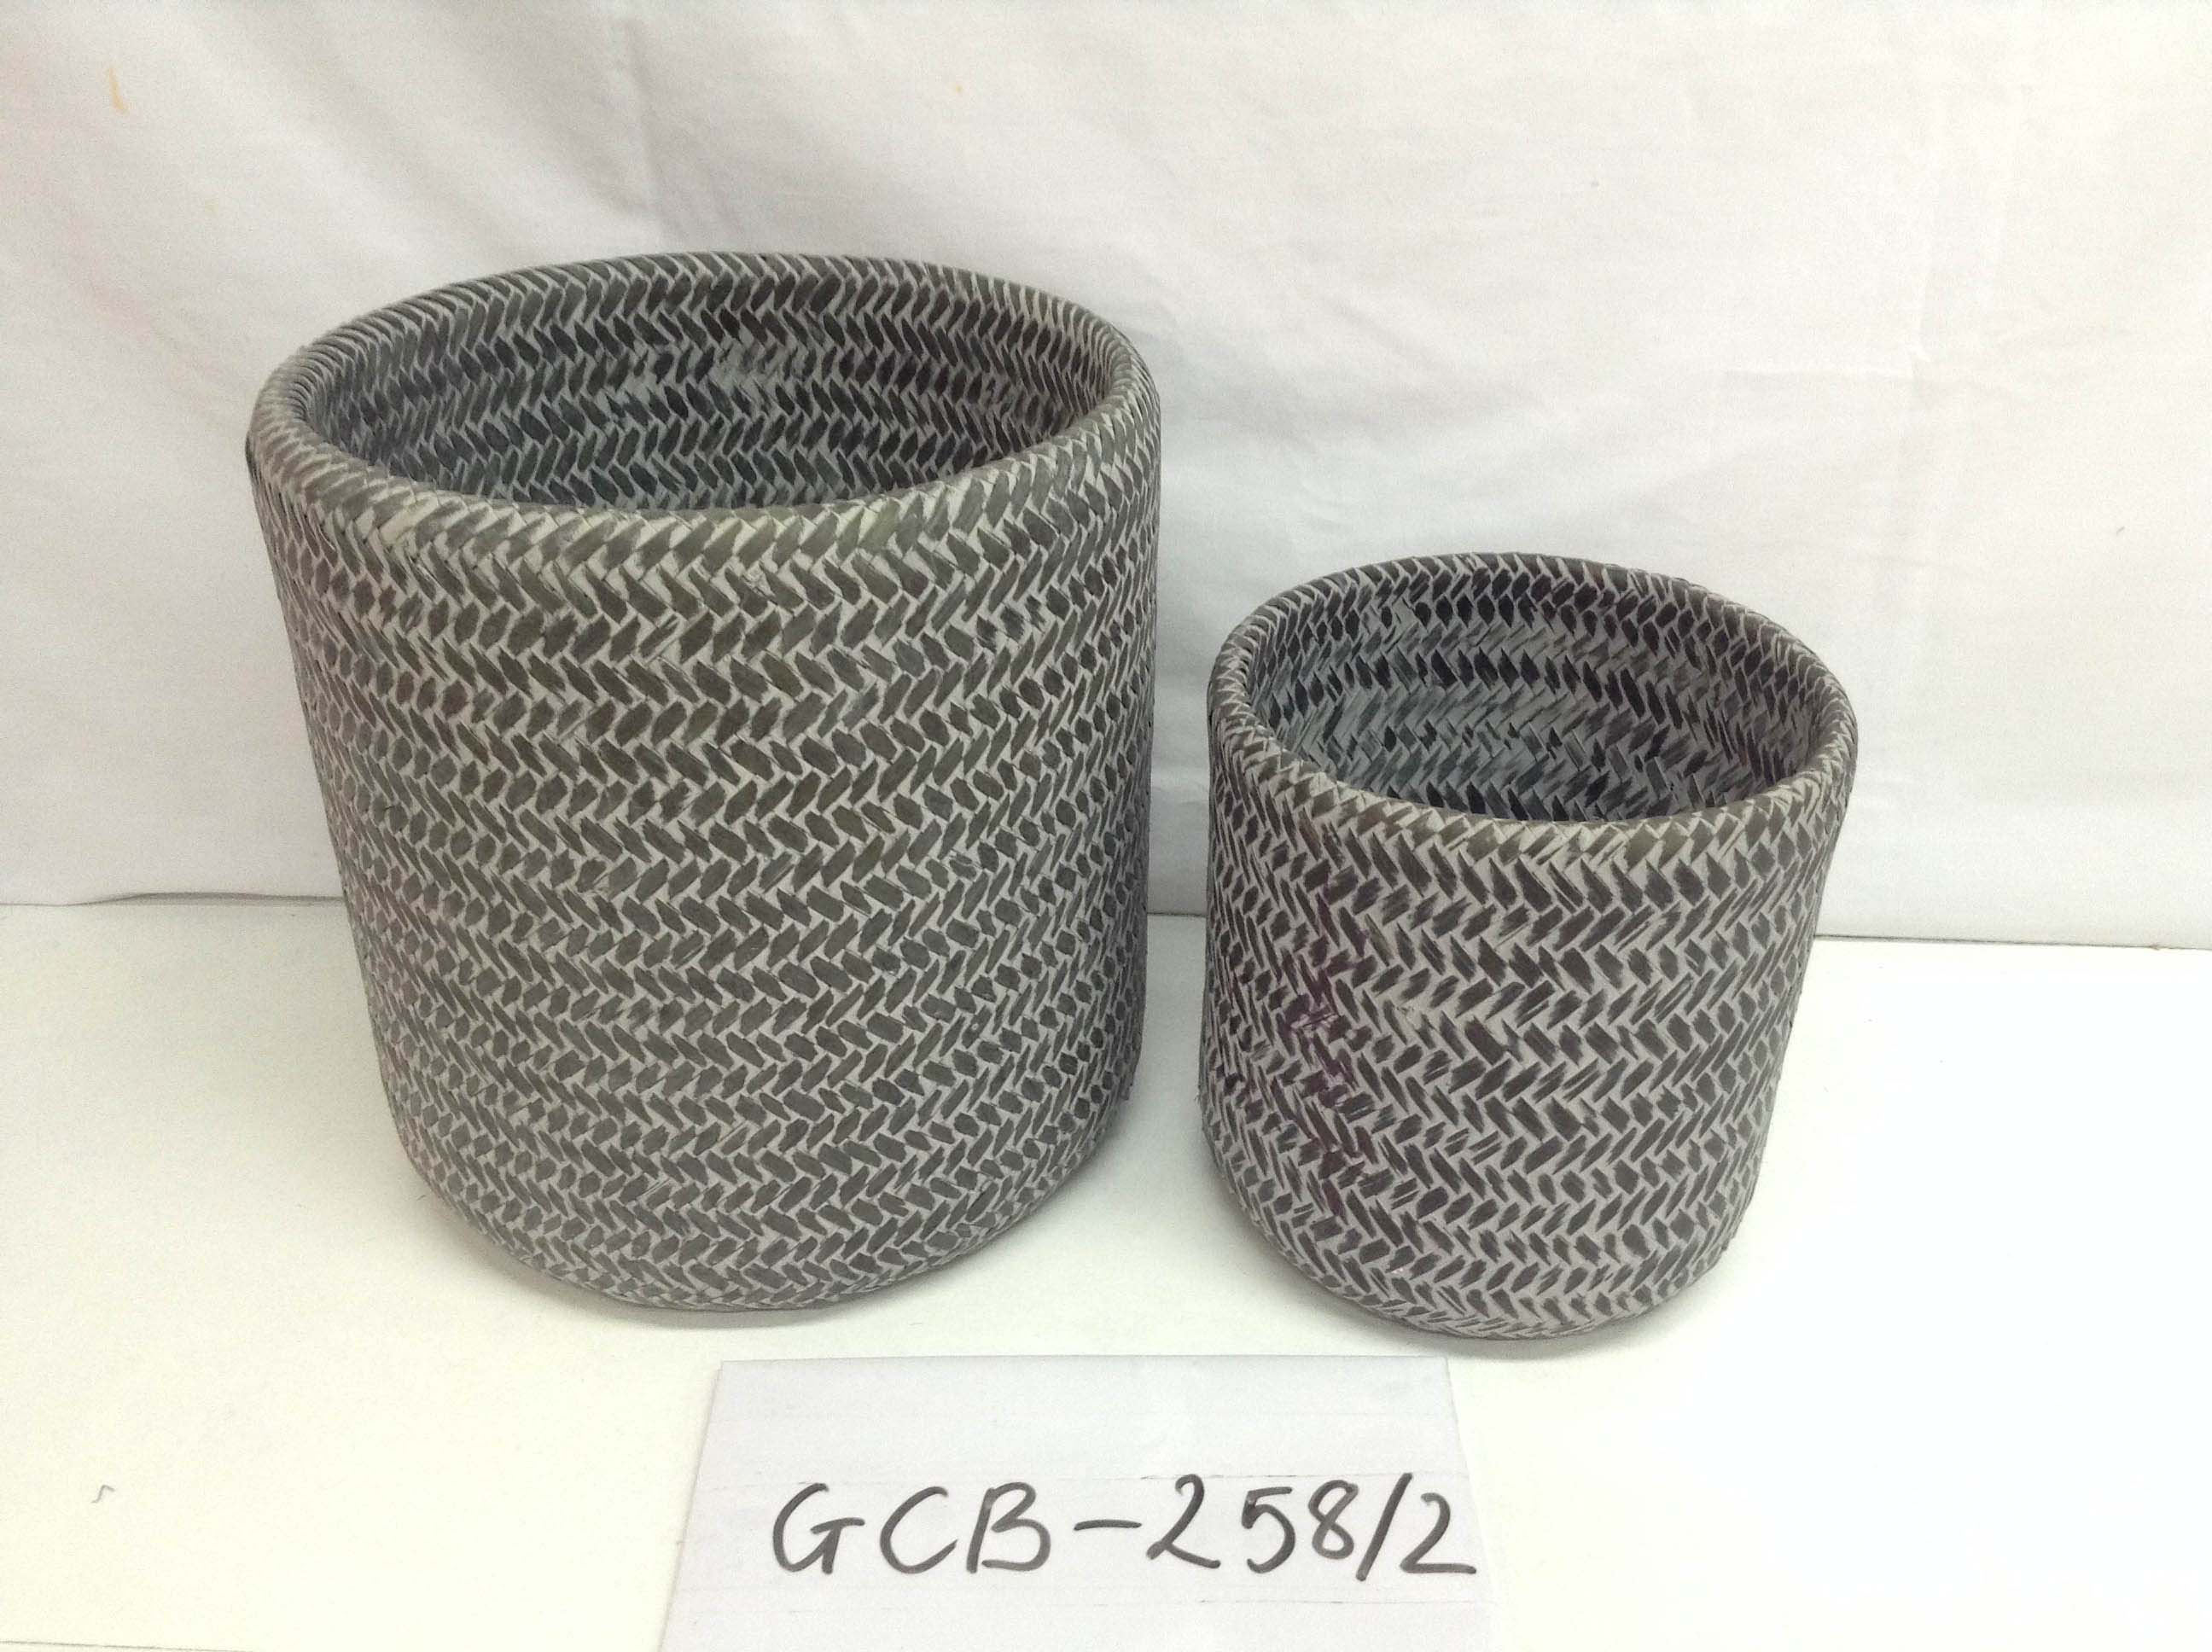 GCB-258-2